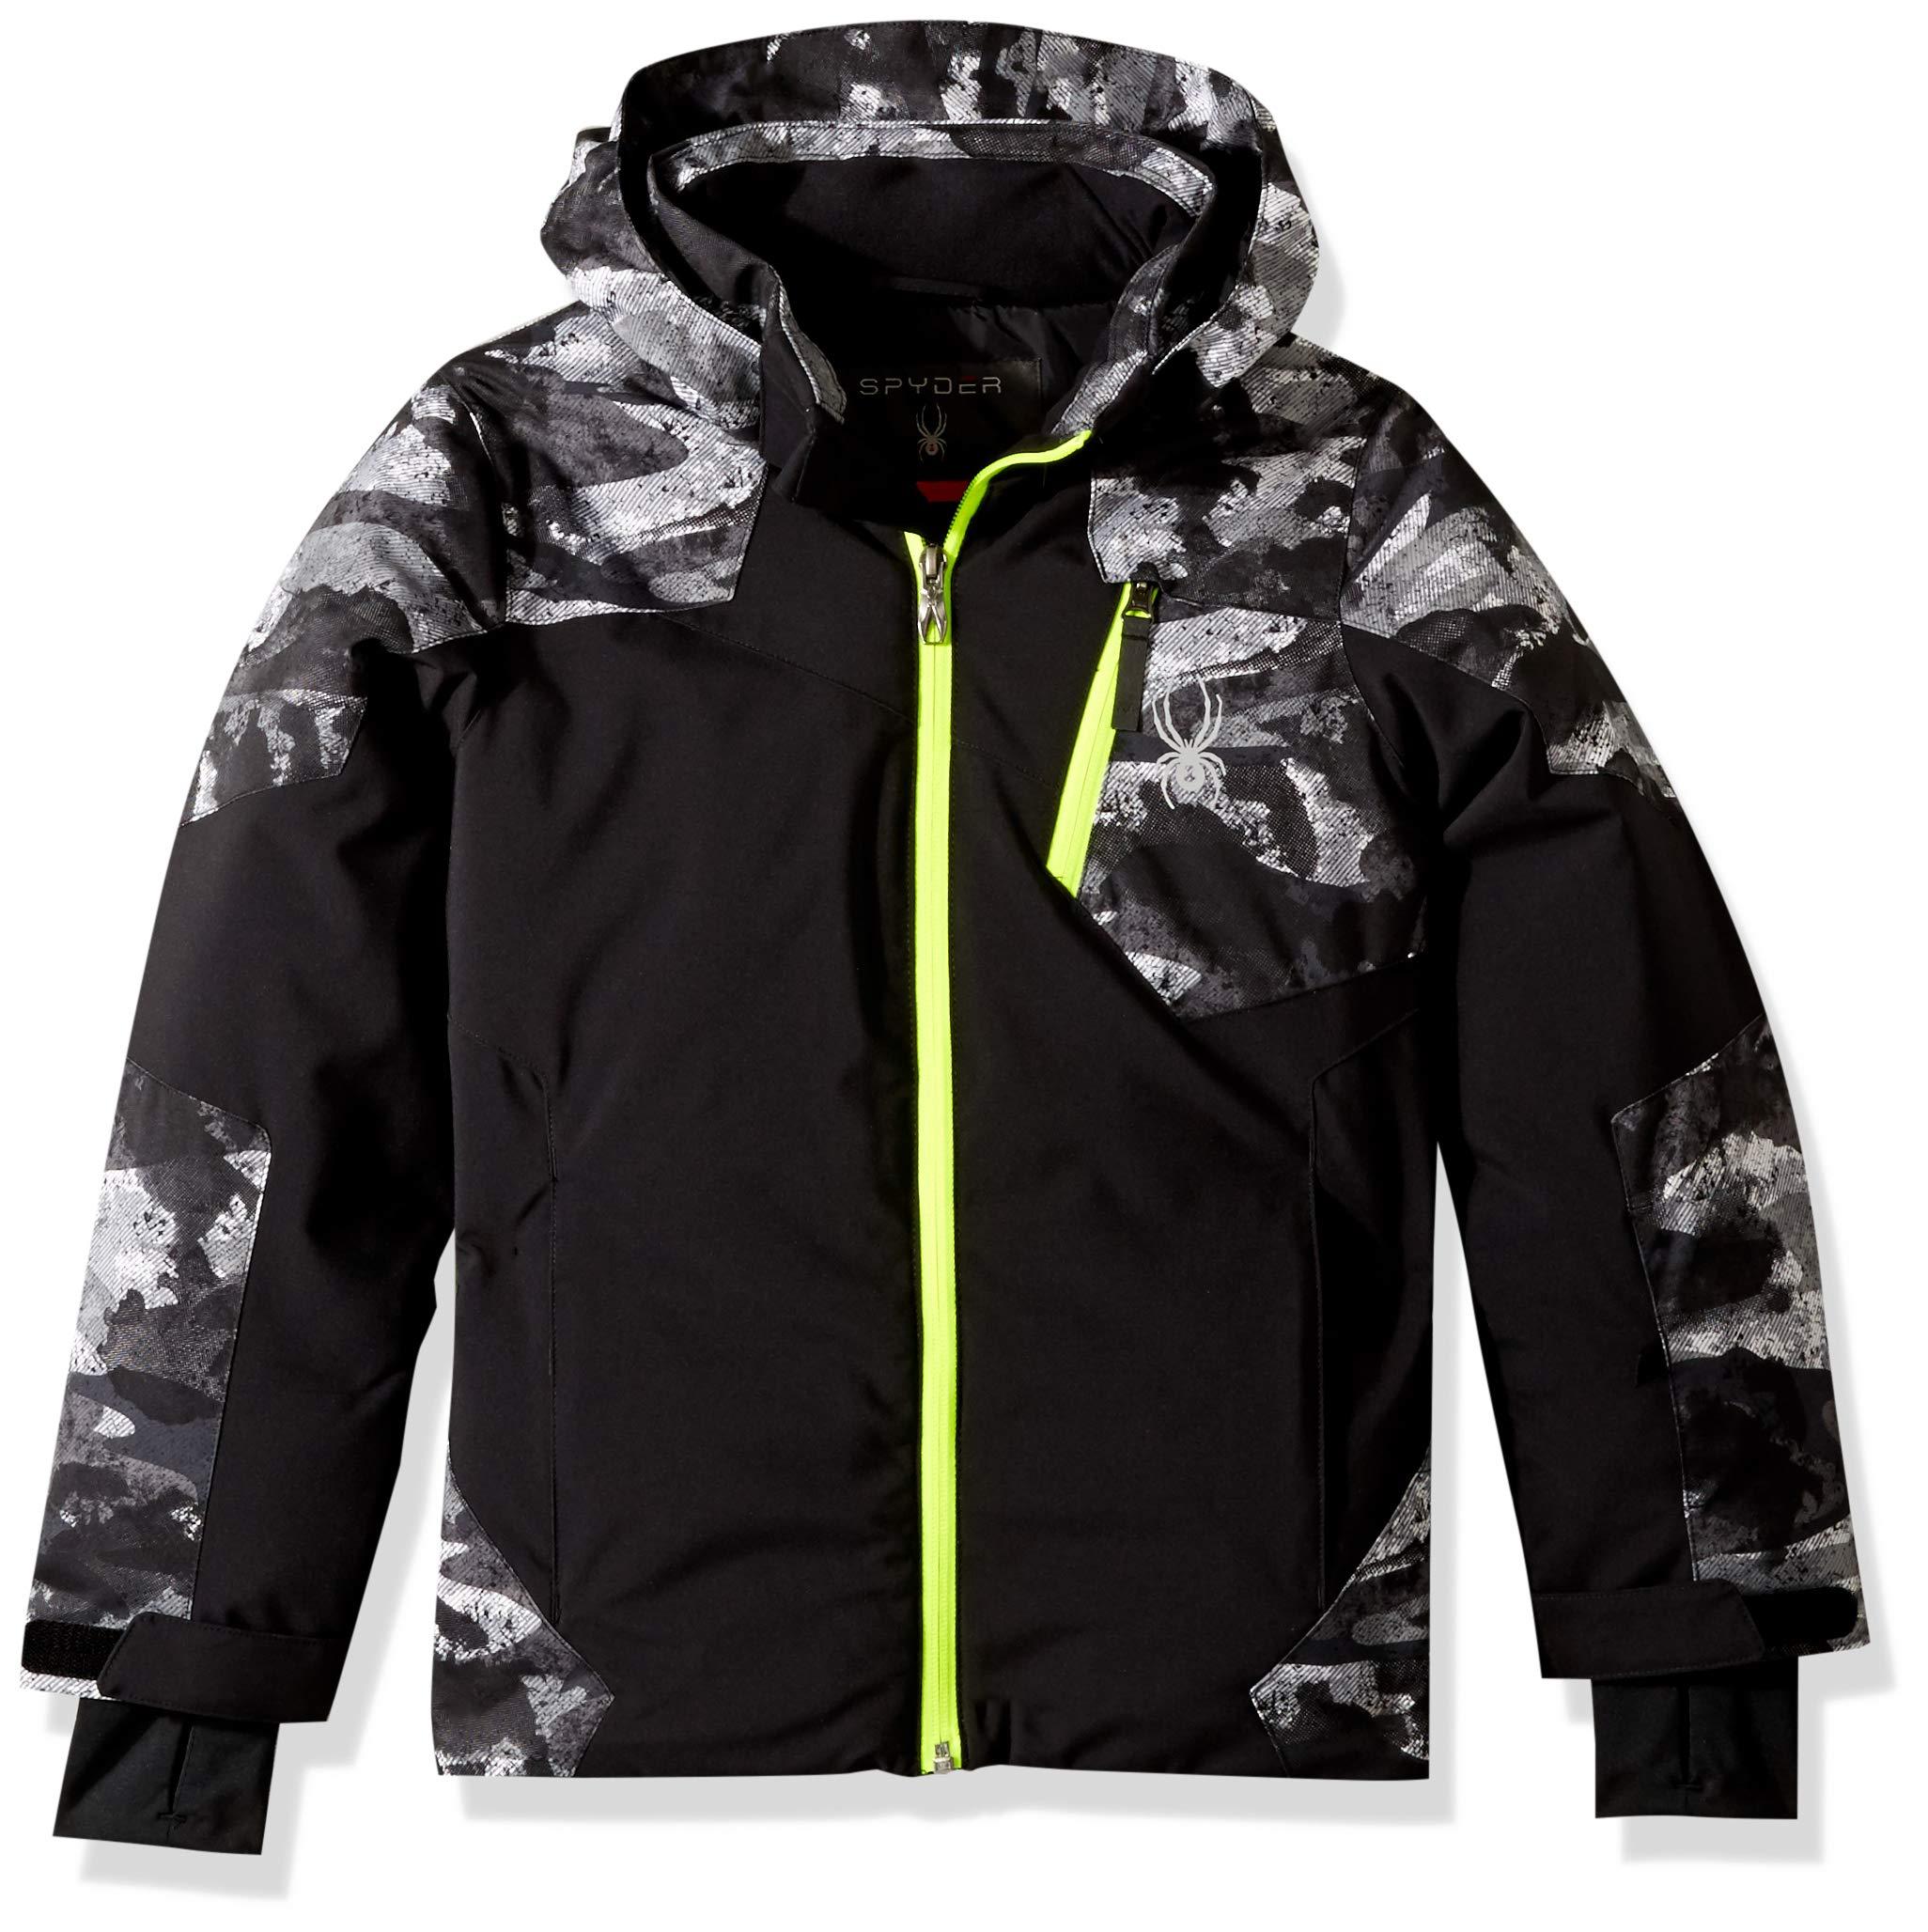 Spyder Boys' Chambers Ski Jacket, Black/Camo Distress Print/Bryte Yellow, Size 8